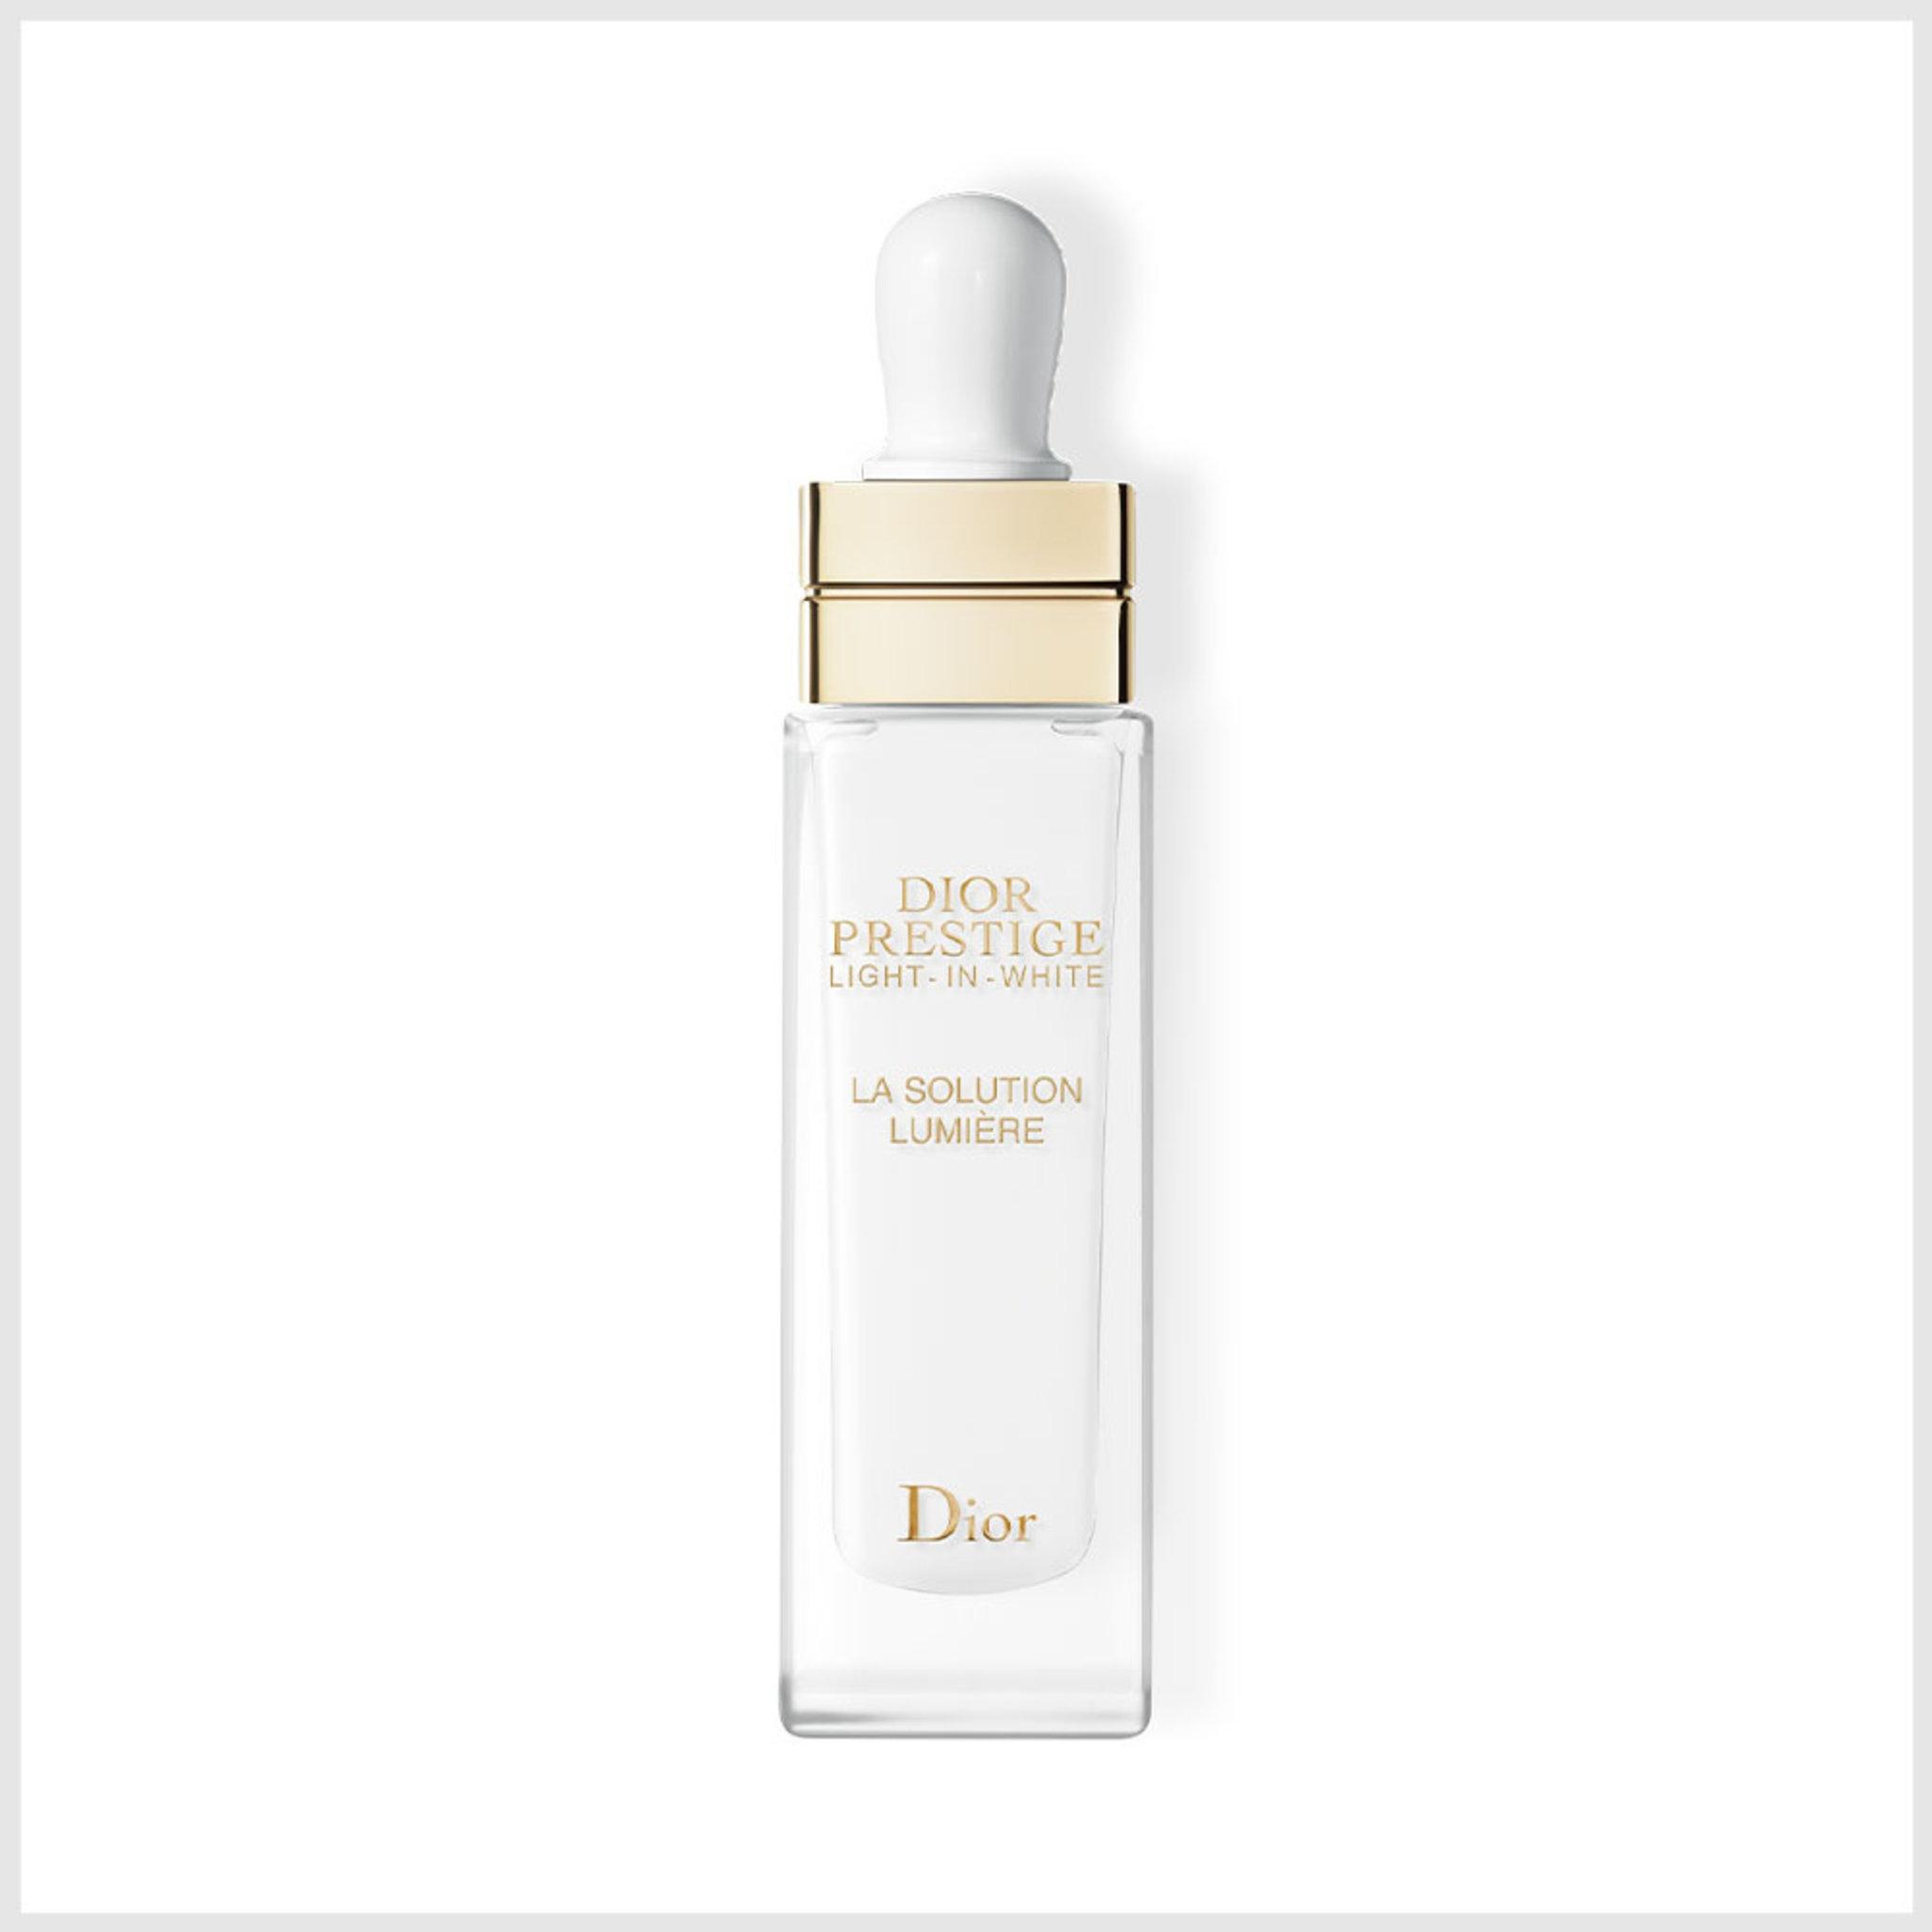 Dior Prestige Light-In-WhiteLa Solution Lumière, 30 ML